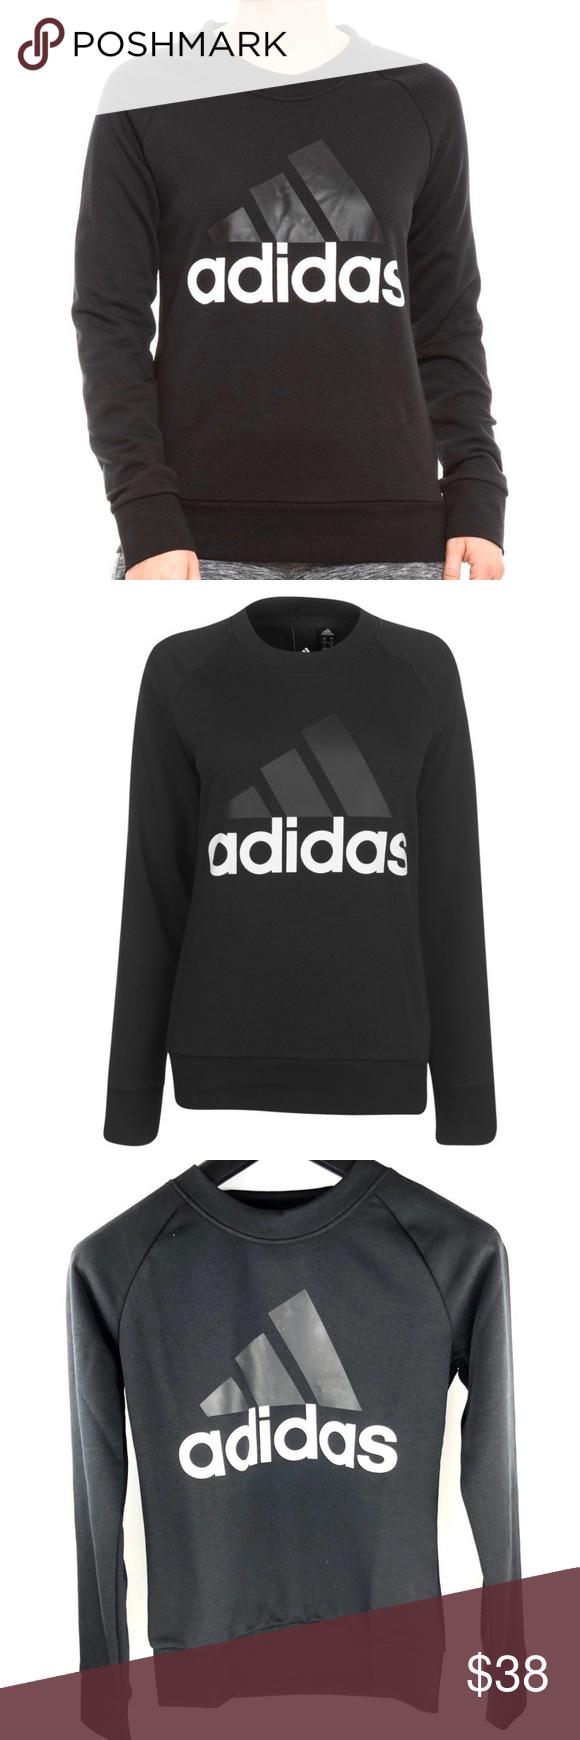 Adidas Womens Crew Neck Sweatshirt Black Crewneck Sweatshirt Women Adidas Women Black Sweatshirts [ 1740 x 580 Pixel ]